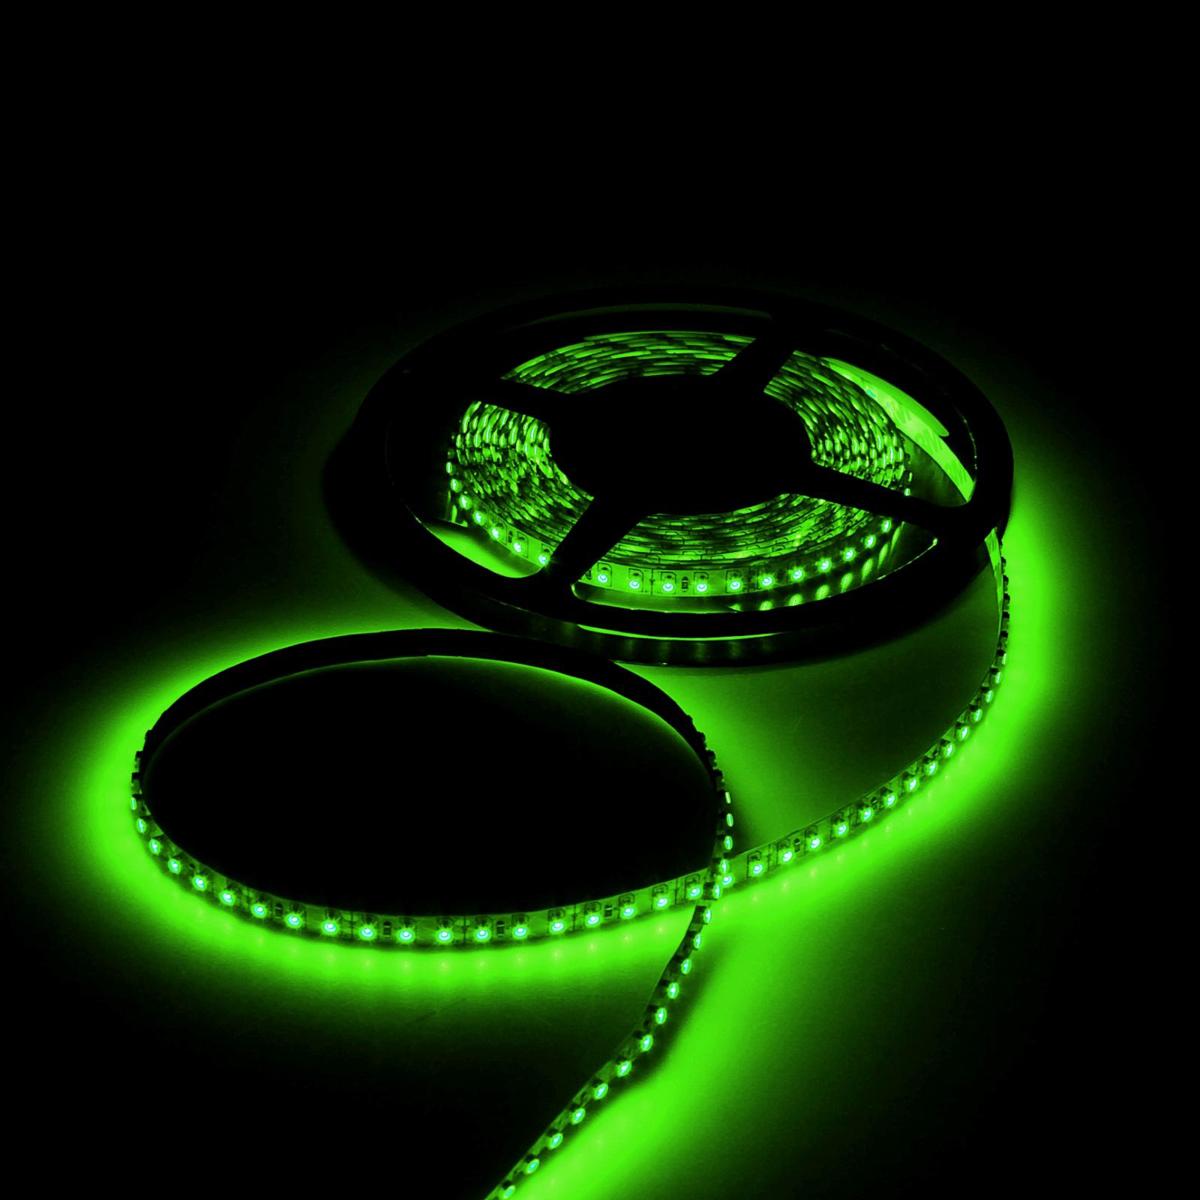 Светодиодная лента Luazon, 12В, SMD3528, длина 5 м, IP33, 120 LED ламп, 9.6 Вт/м, 6-7 Лм/1 LED, DC, цвет: зеленый. 883897